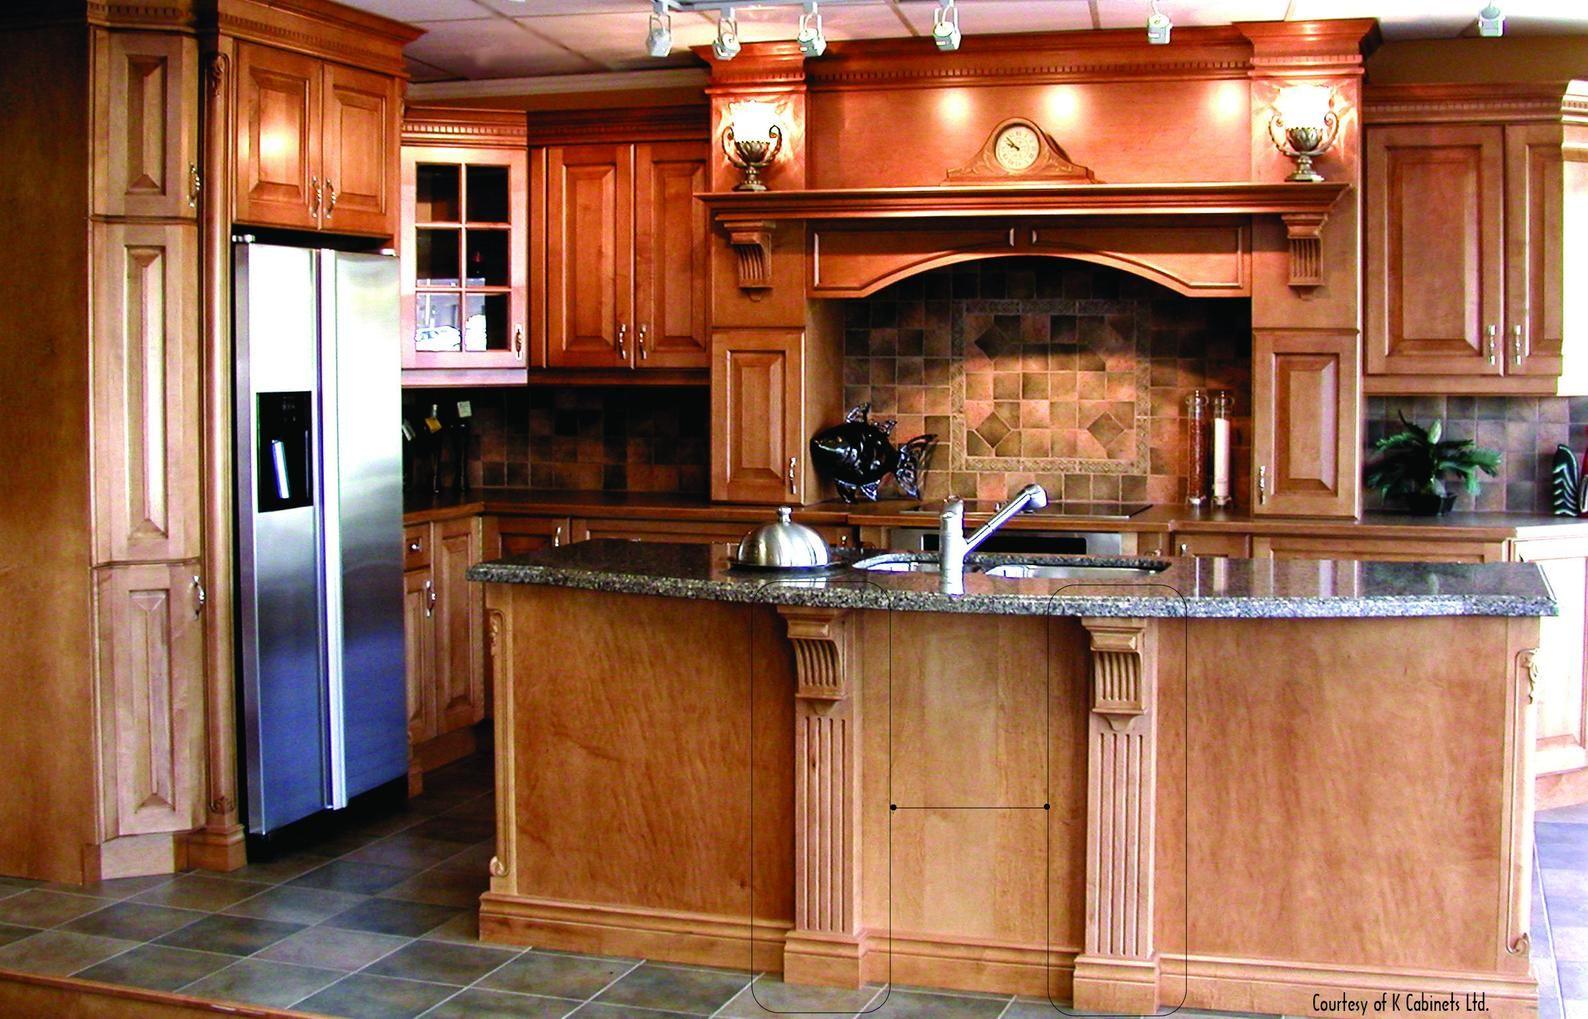 Kitchen Island Post Sanded Unfinished 7 1 2 X Etsy In 2020 Kitchen Pantry Design Kitchen Island Posts Traditional Kitchen Design